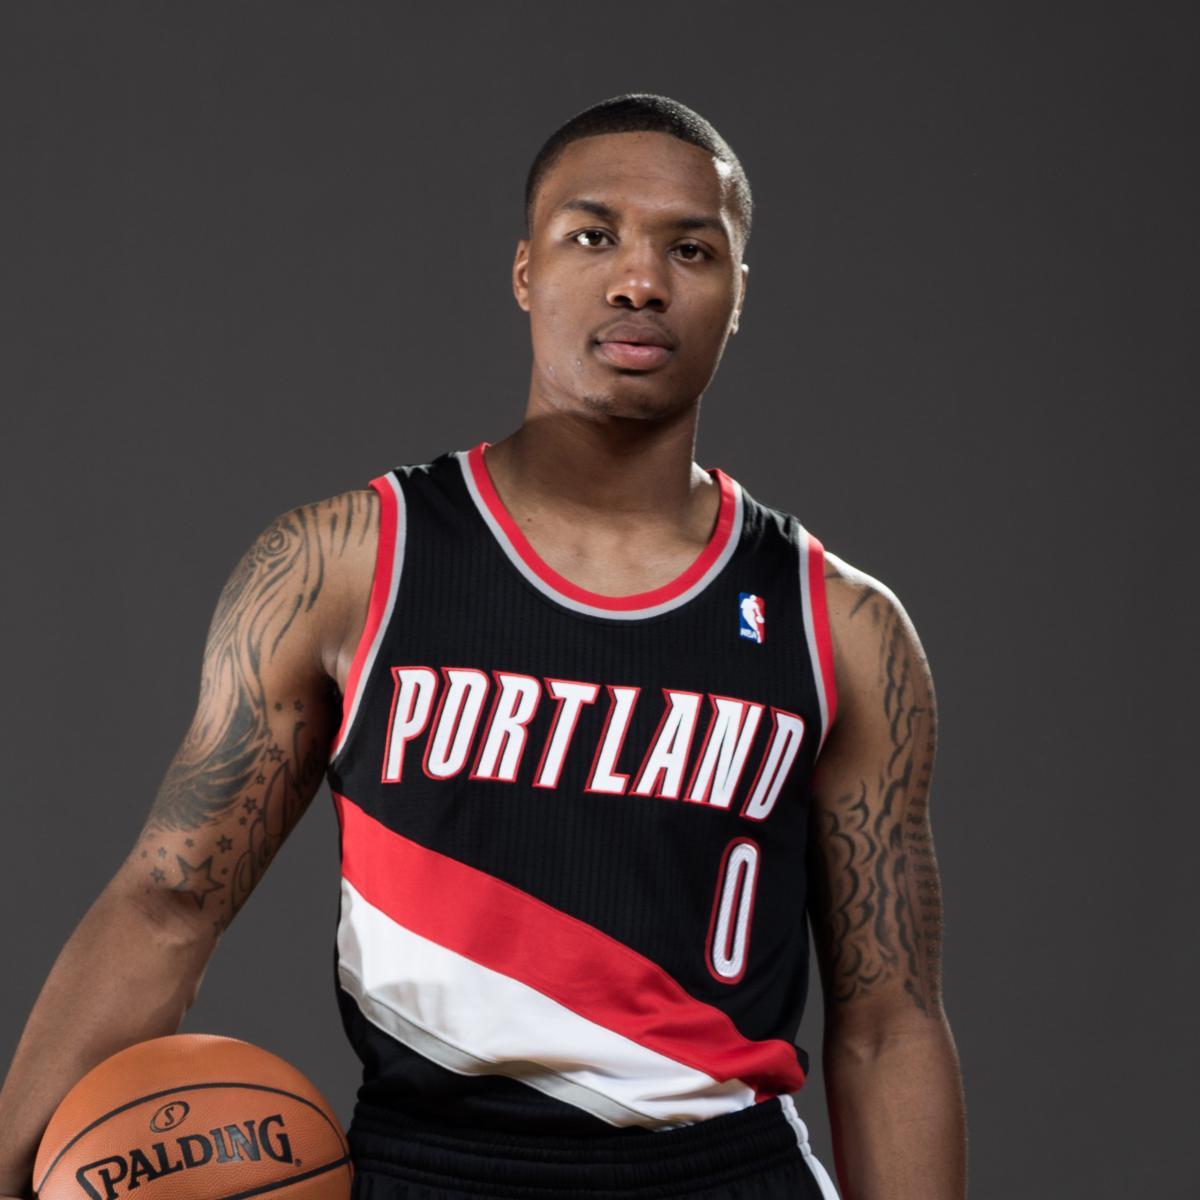 Portland Blazers Roster 2012: Breaking Down Why Damian Lillard Is The Next Chauncey